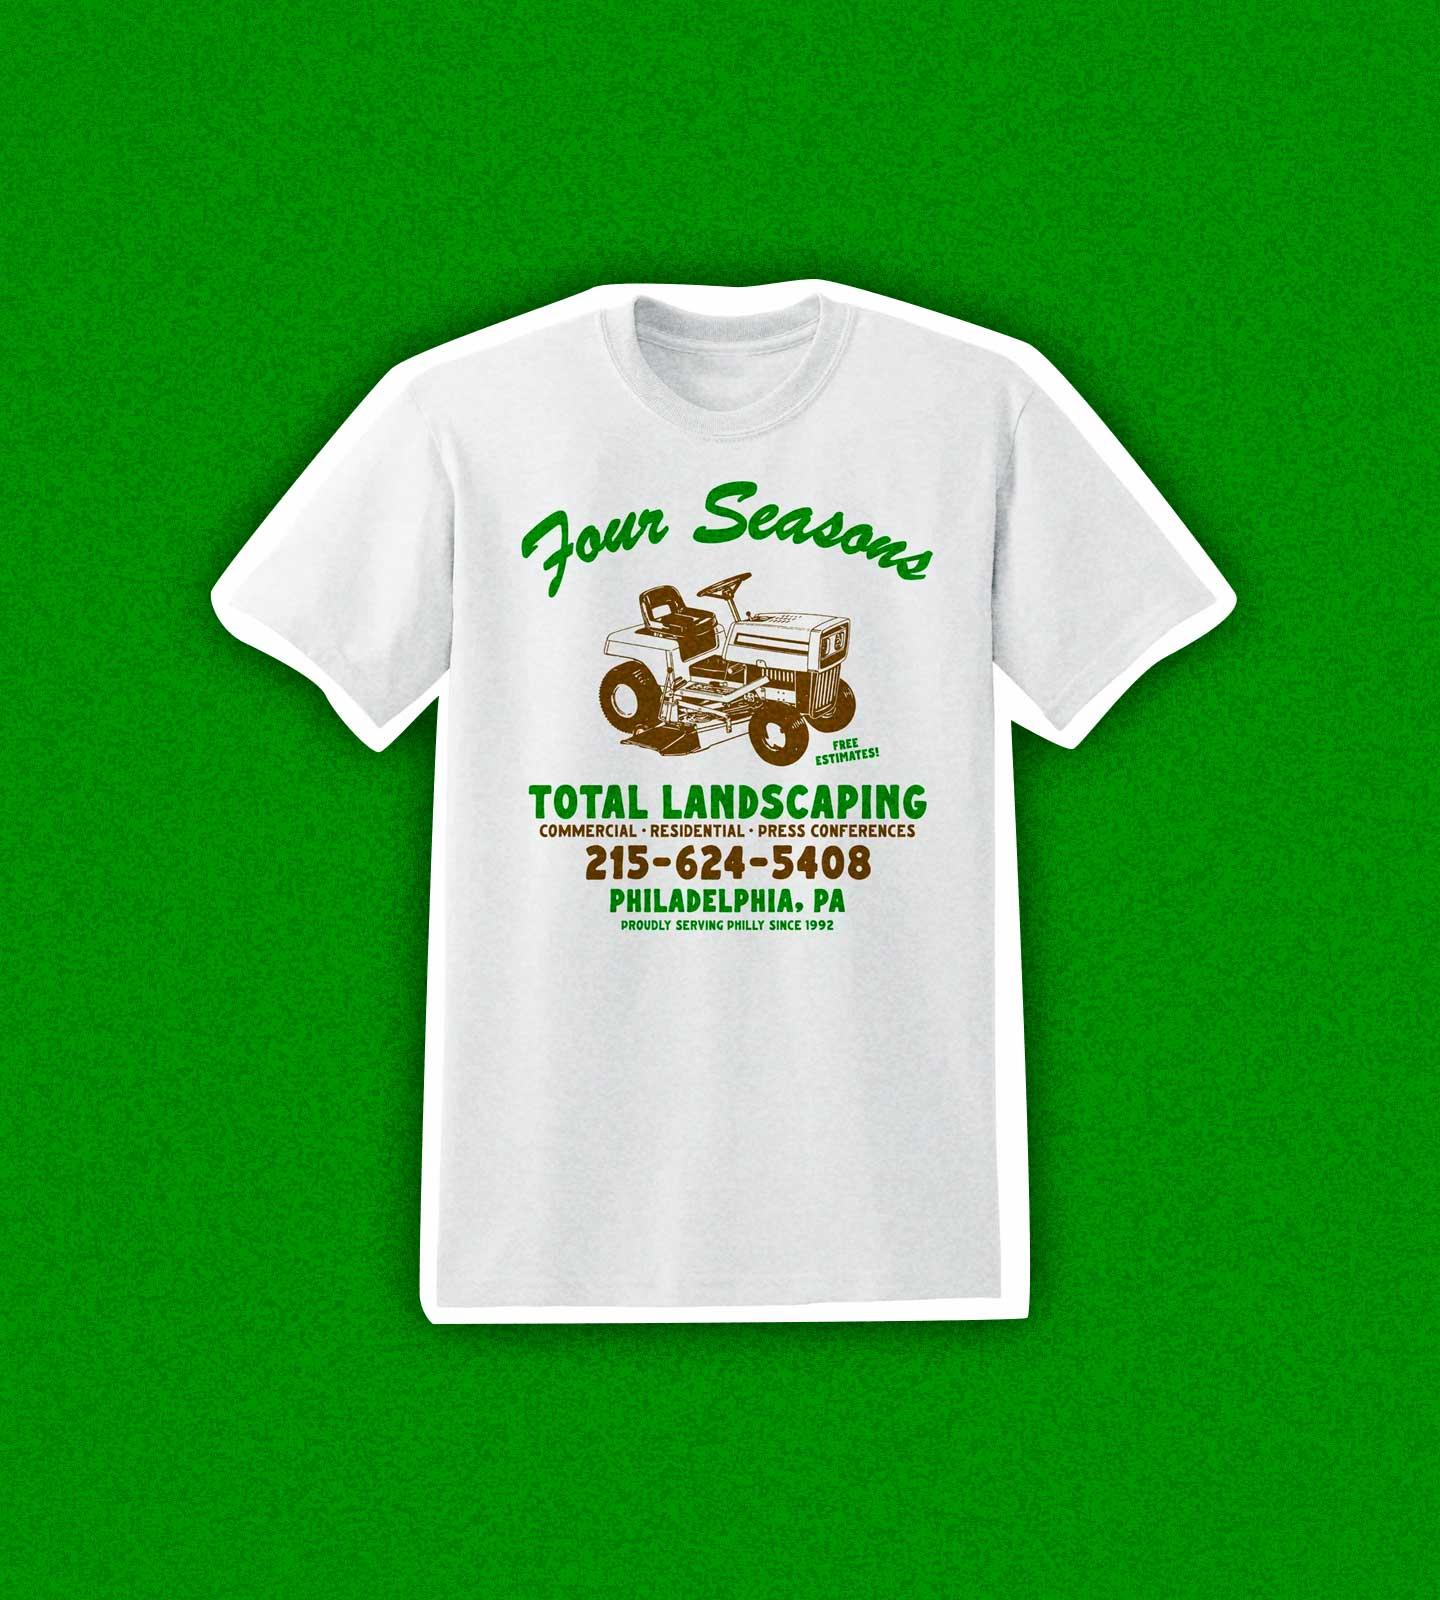 Four Season T-shirt